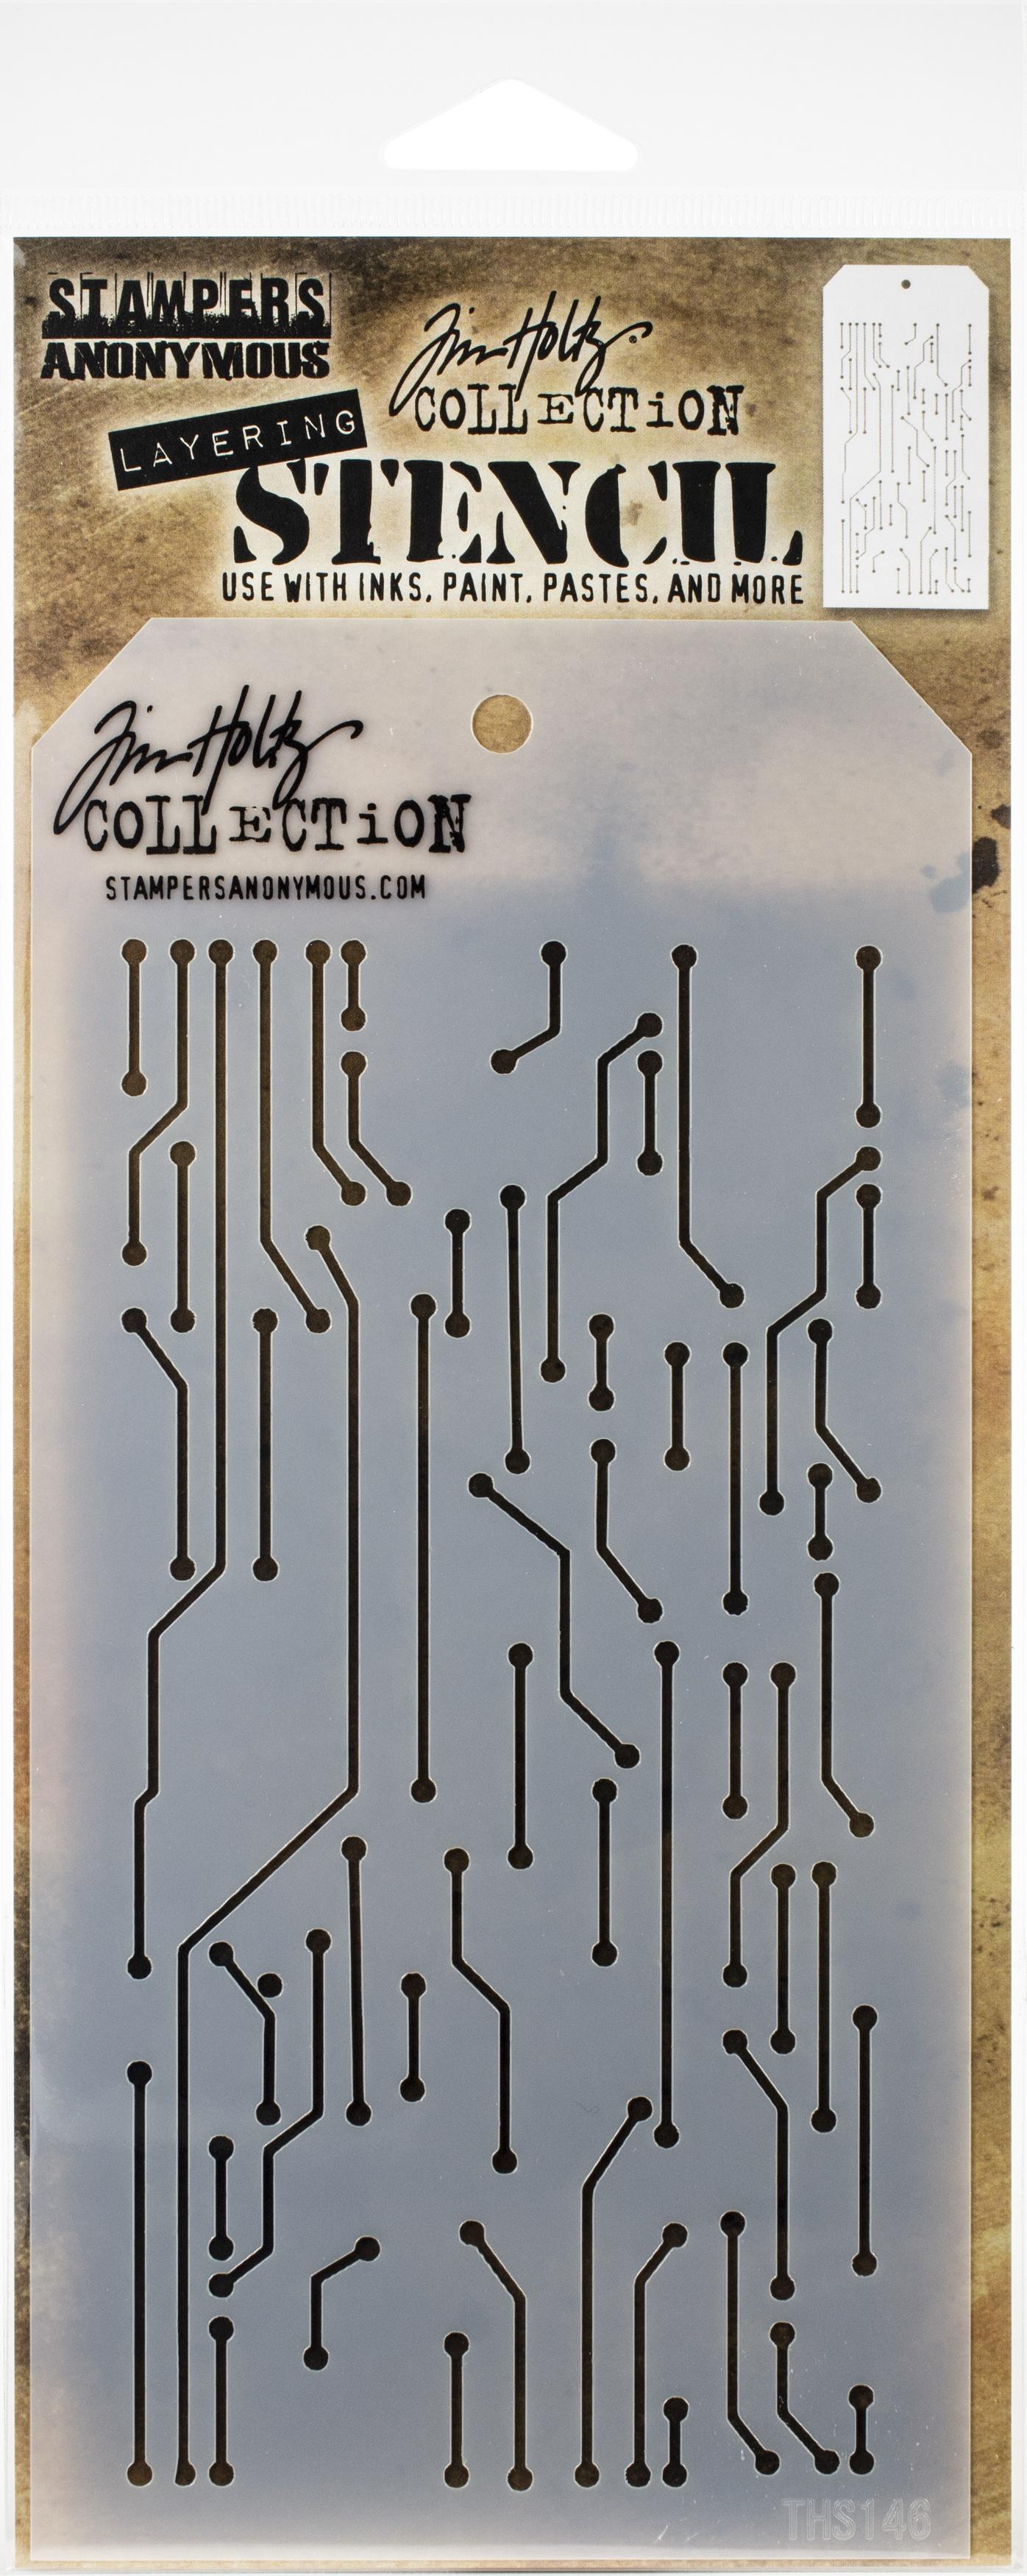 Tim Holtz Layered Stencil 4.125X8.5-Circuit -Layered